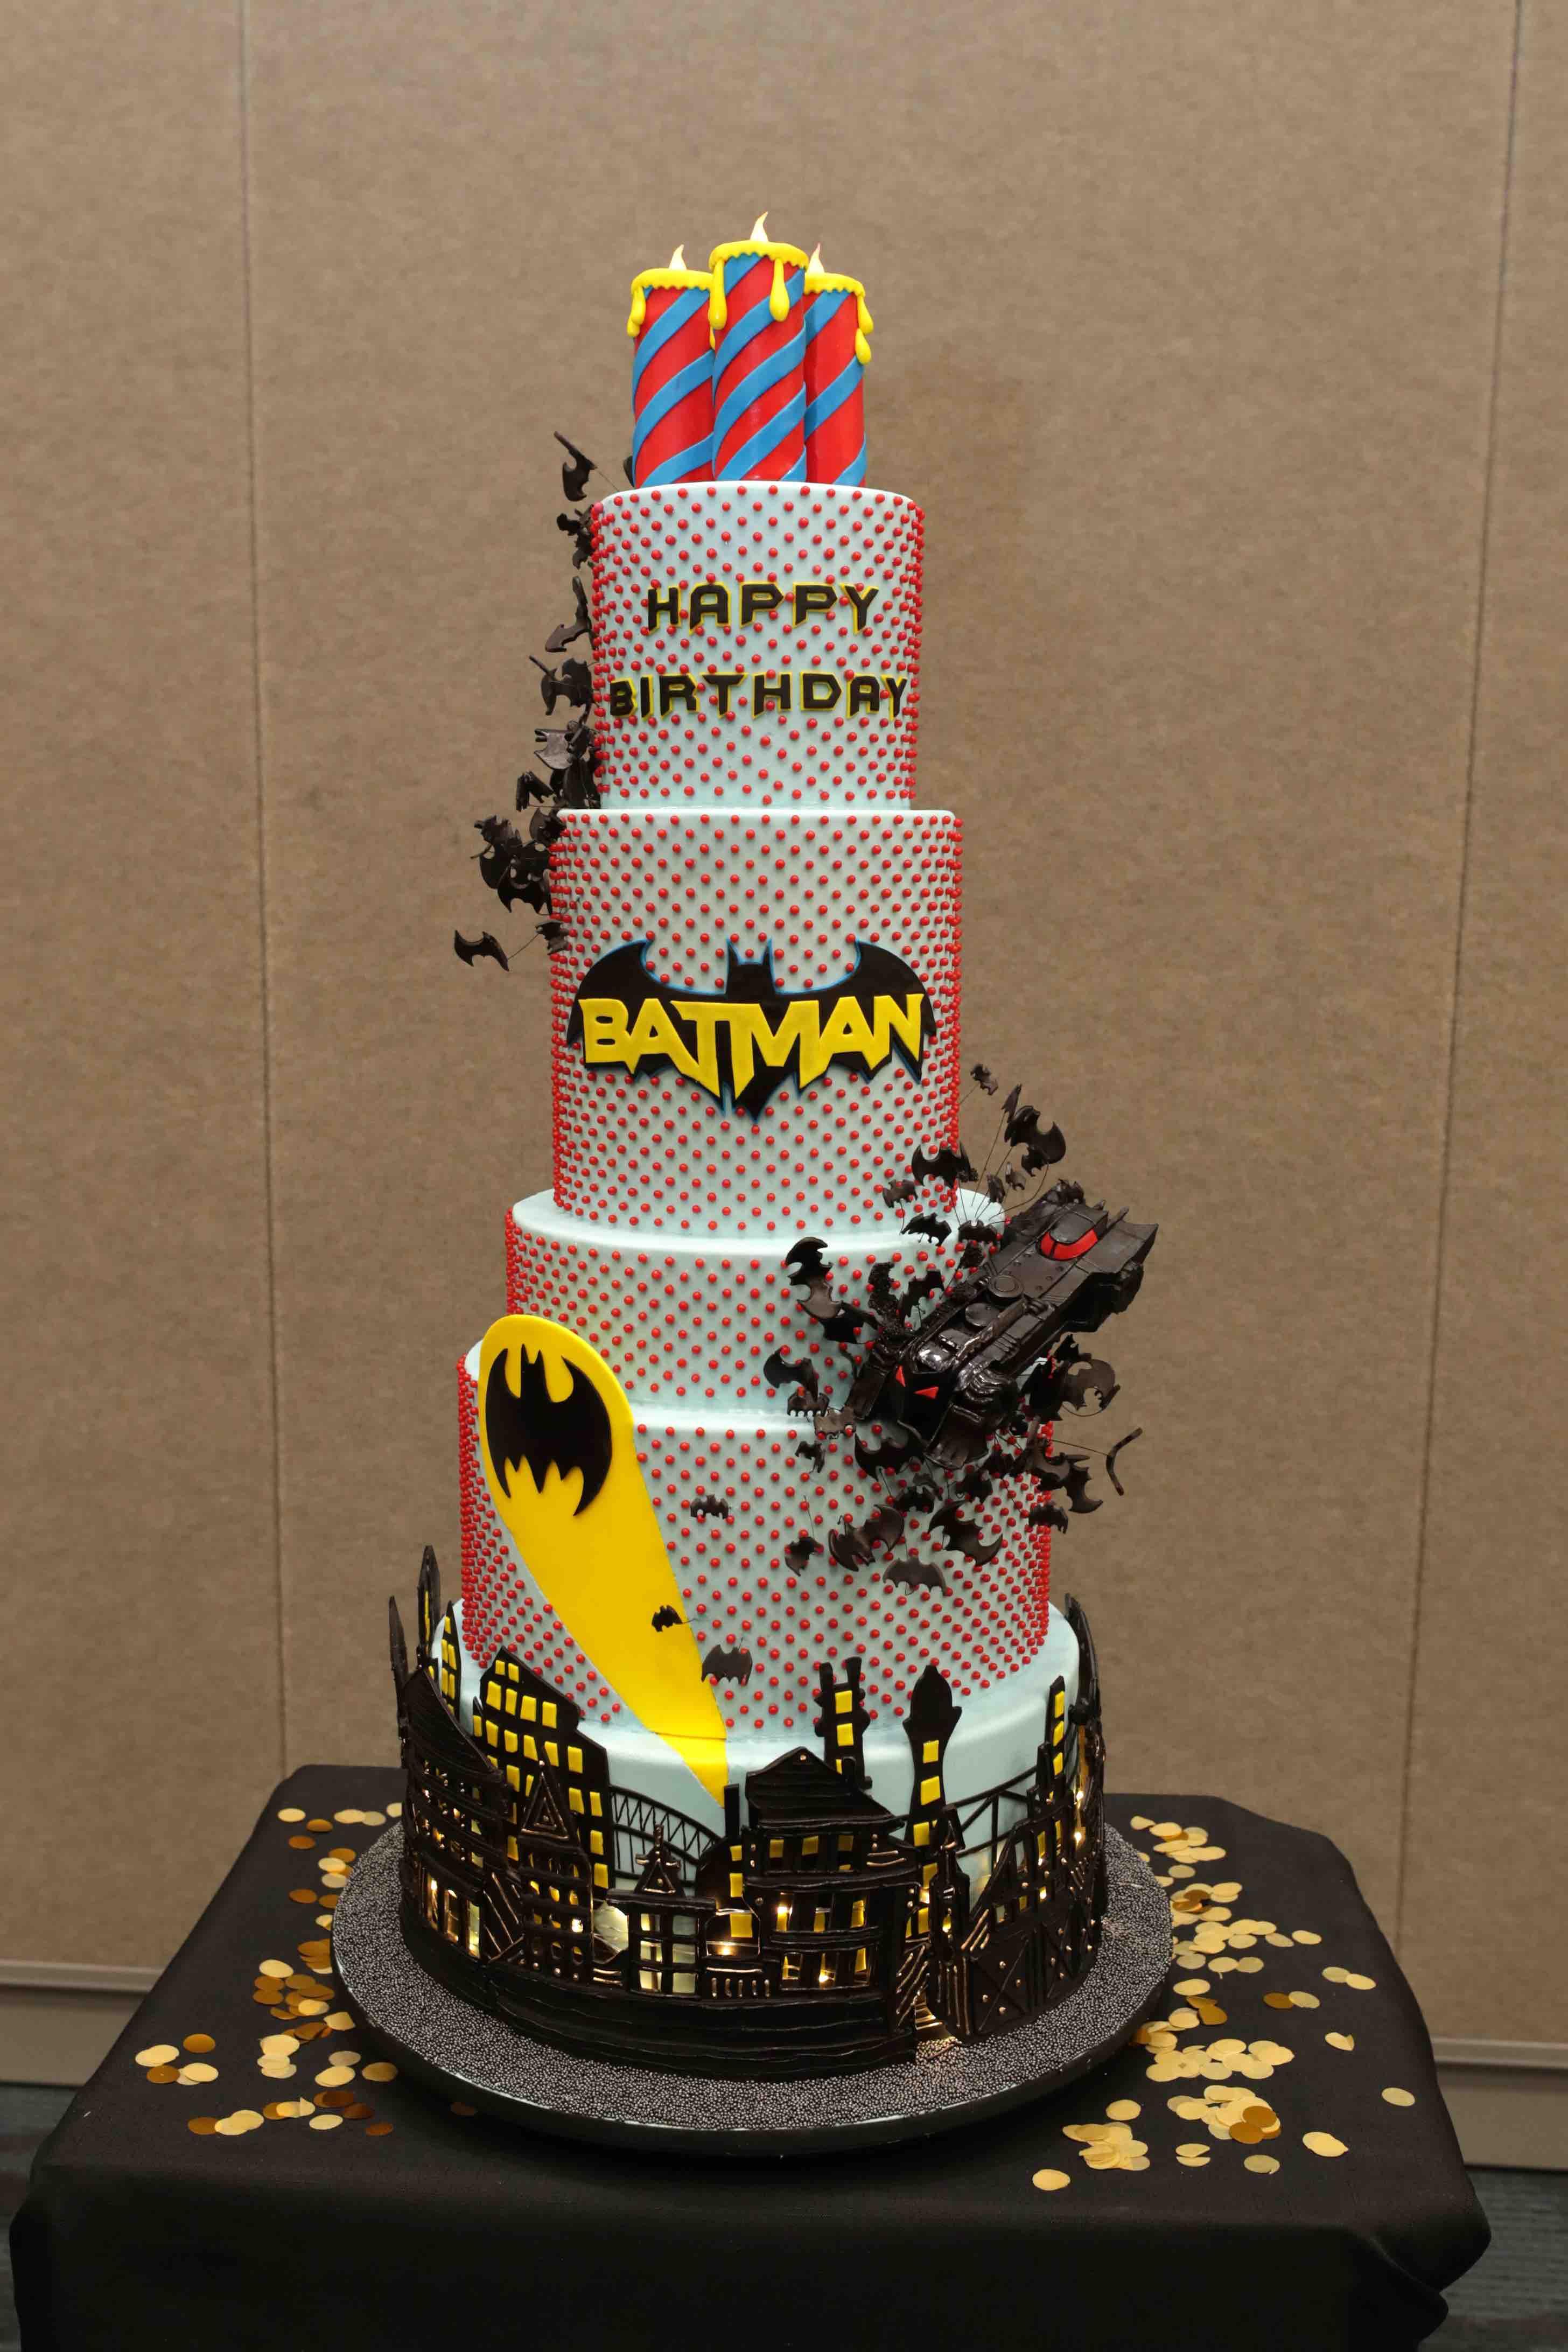 Happy Birthday Batman Cake